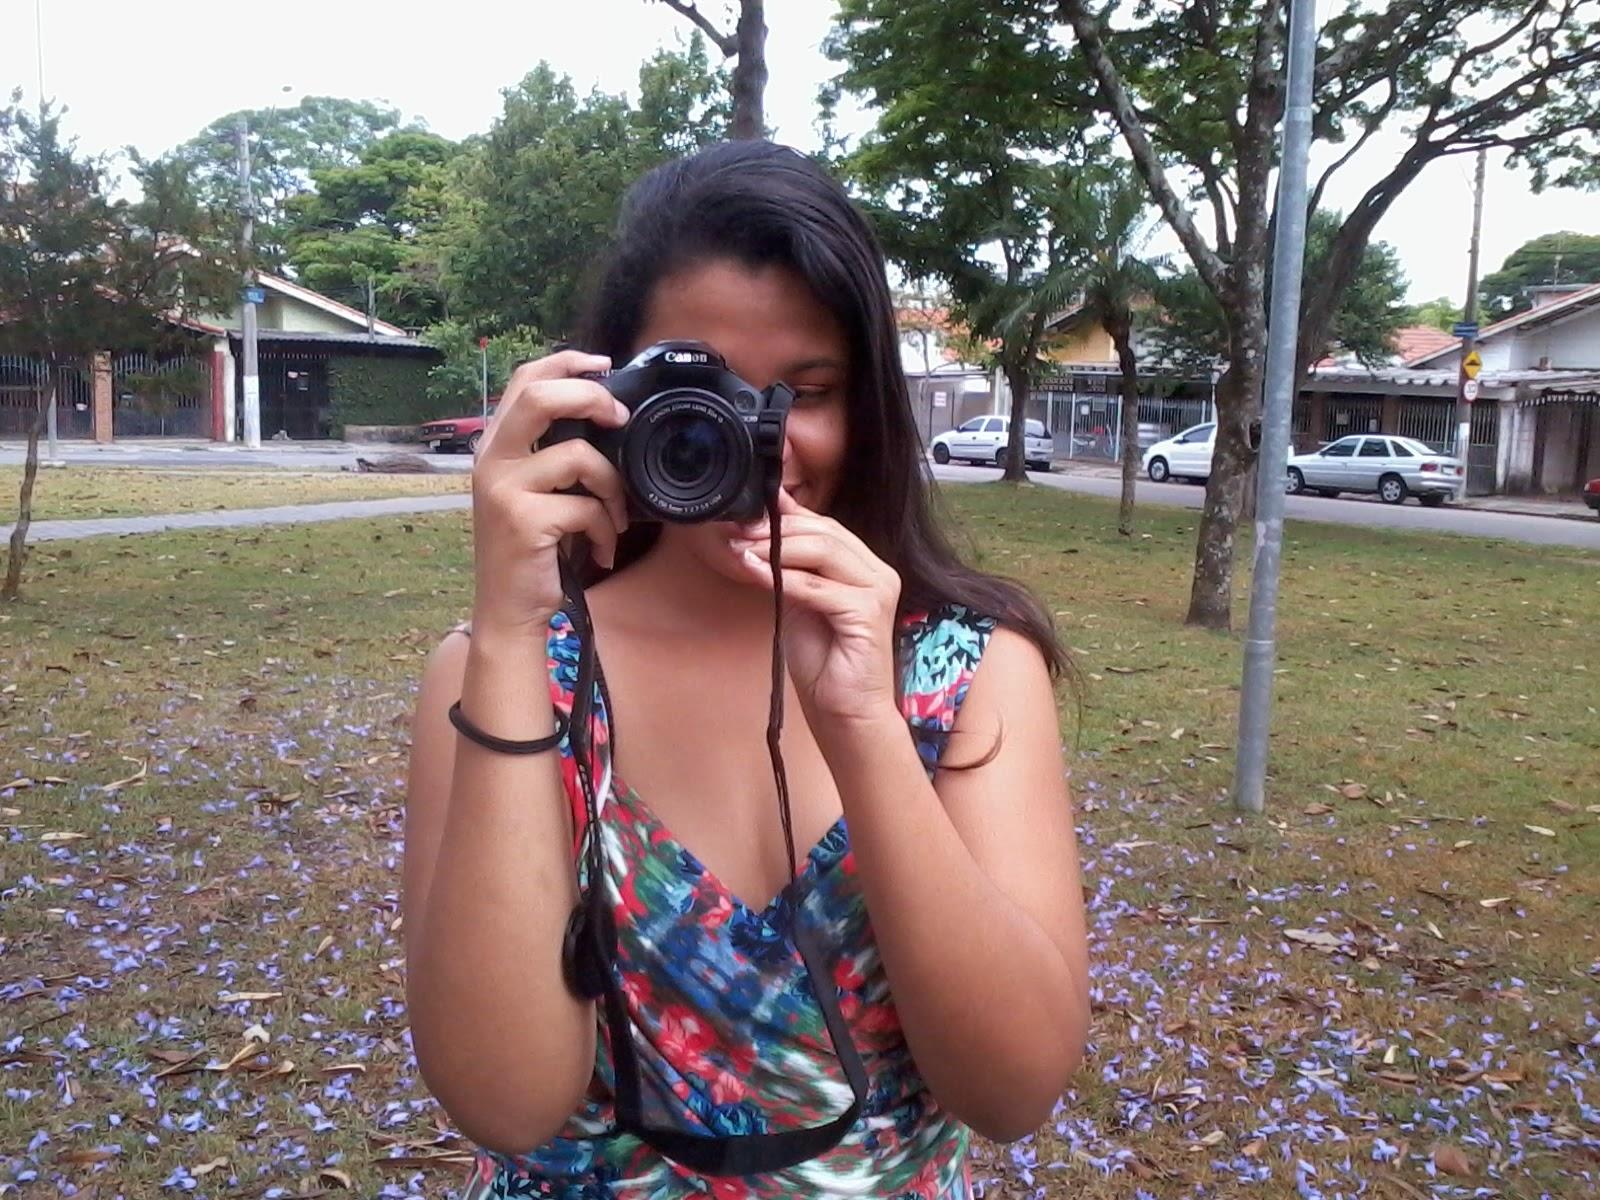 Shaline Lopes